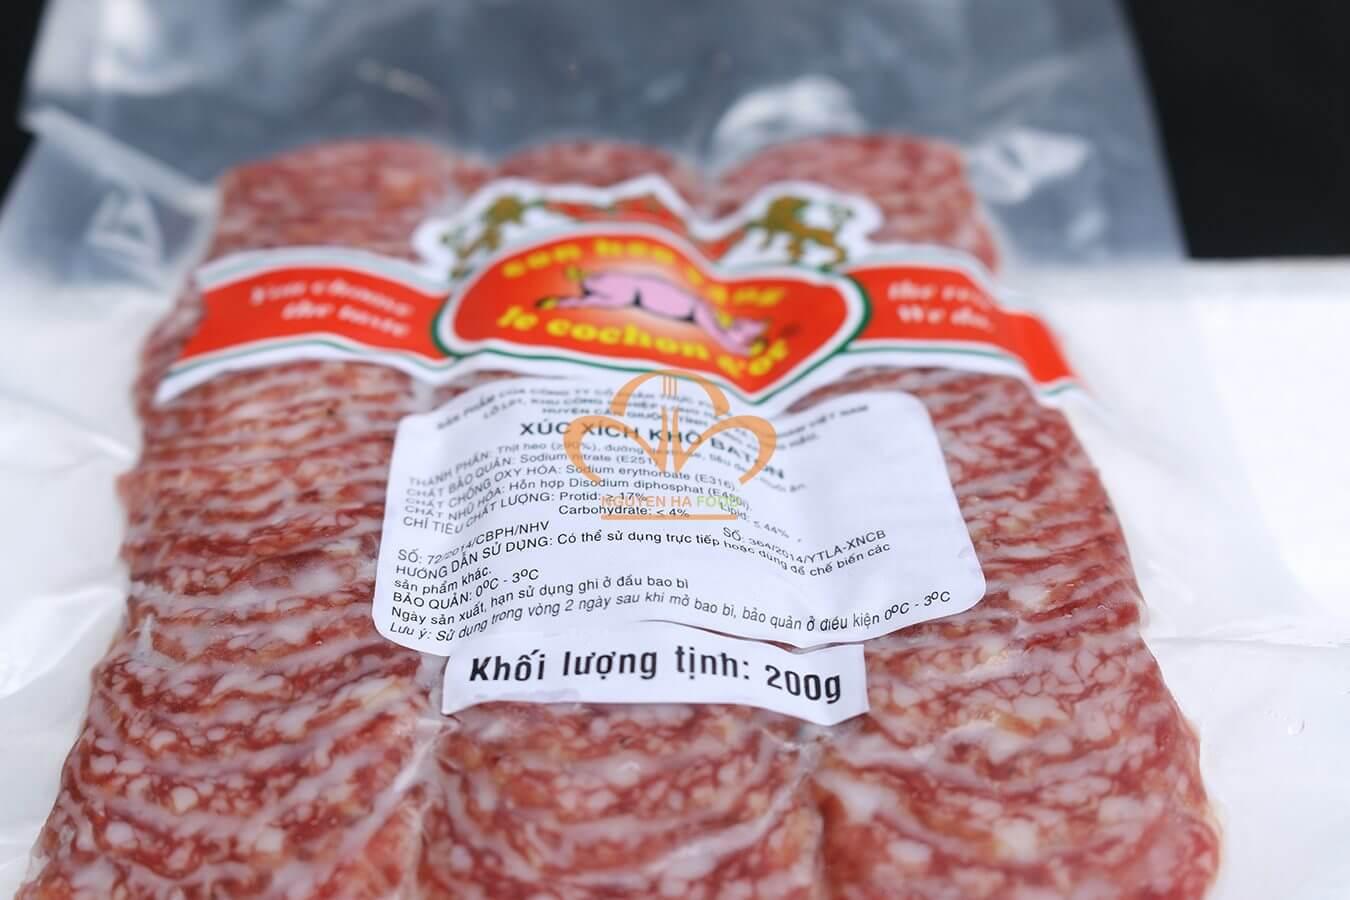 xuc-xich-kho-cat-lat-salami-baton-salami-stick-sliced-2